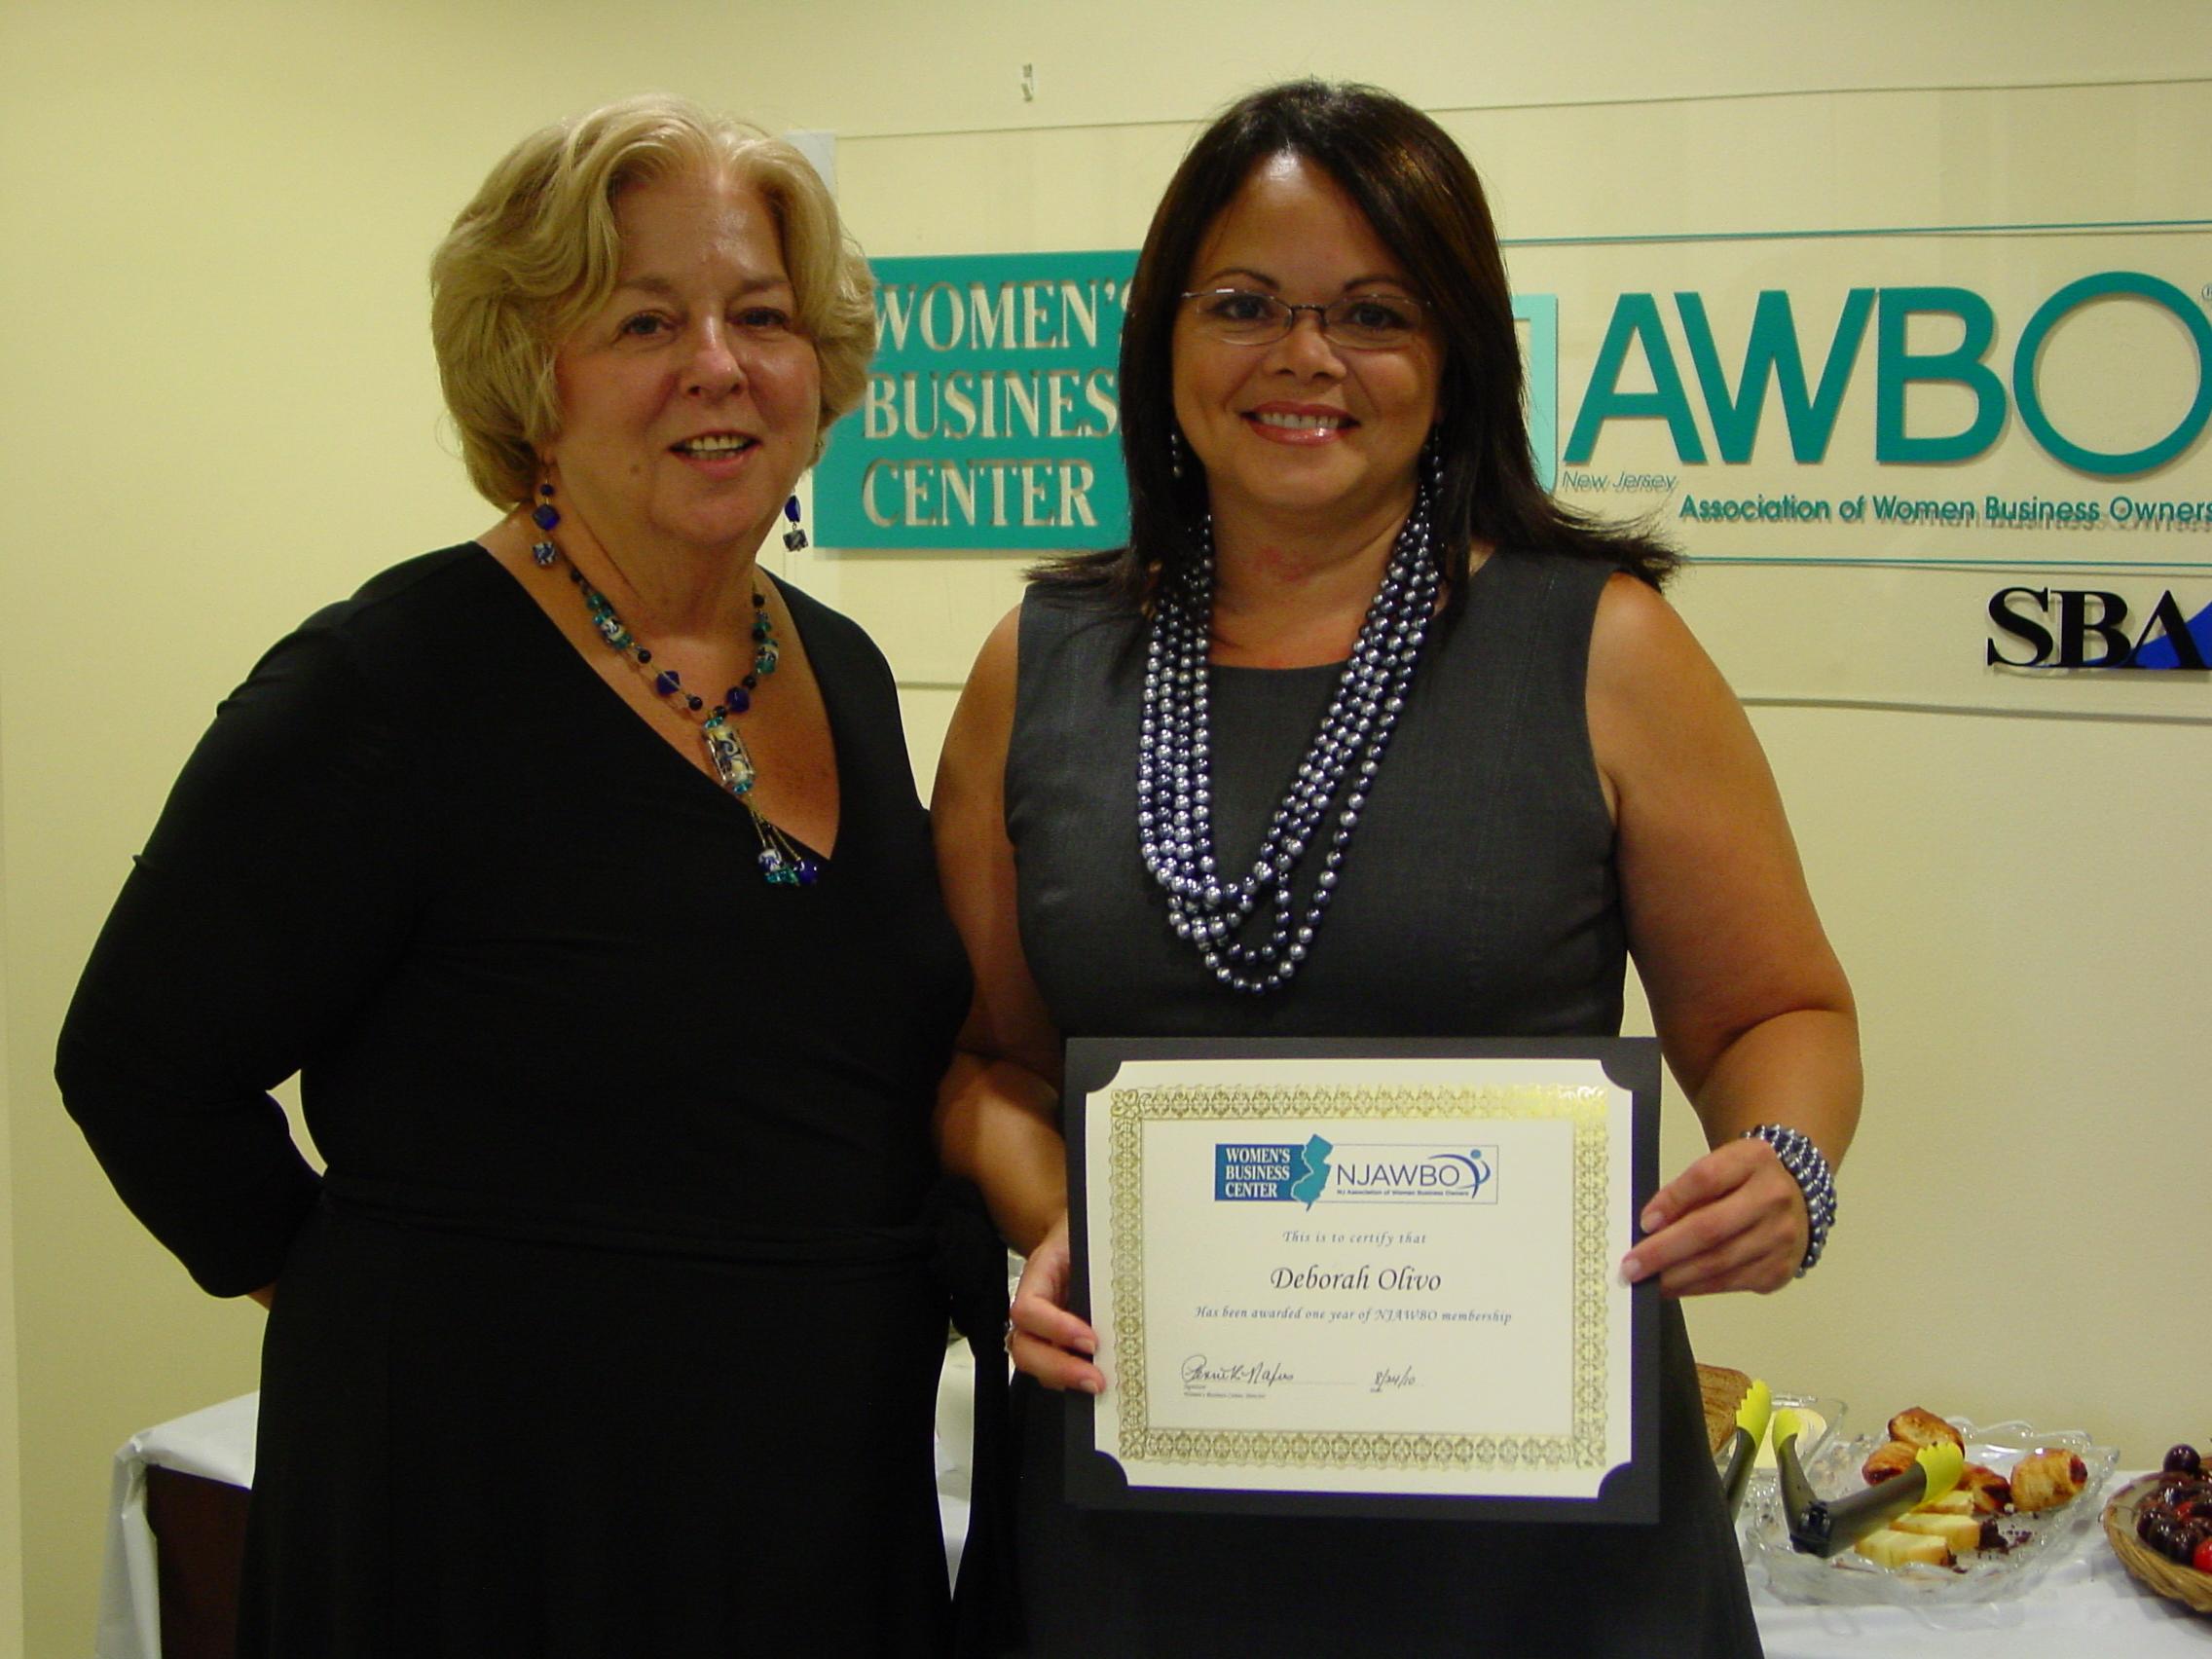 New Jersey Business Development Grant Winner